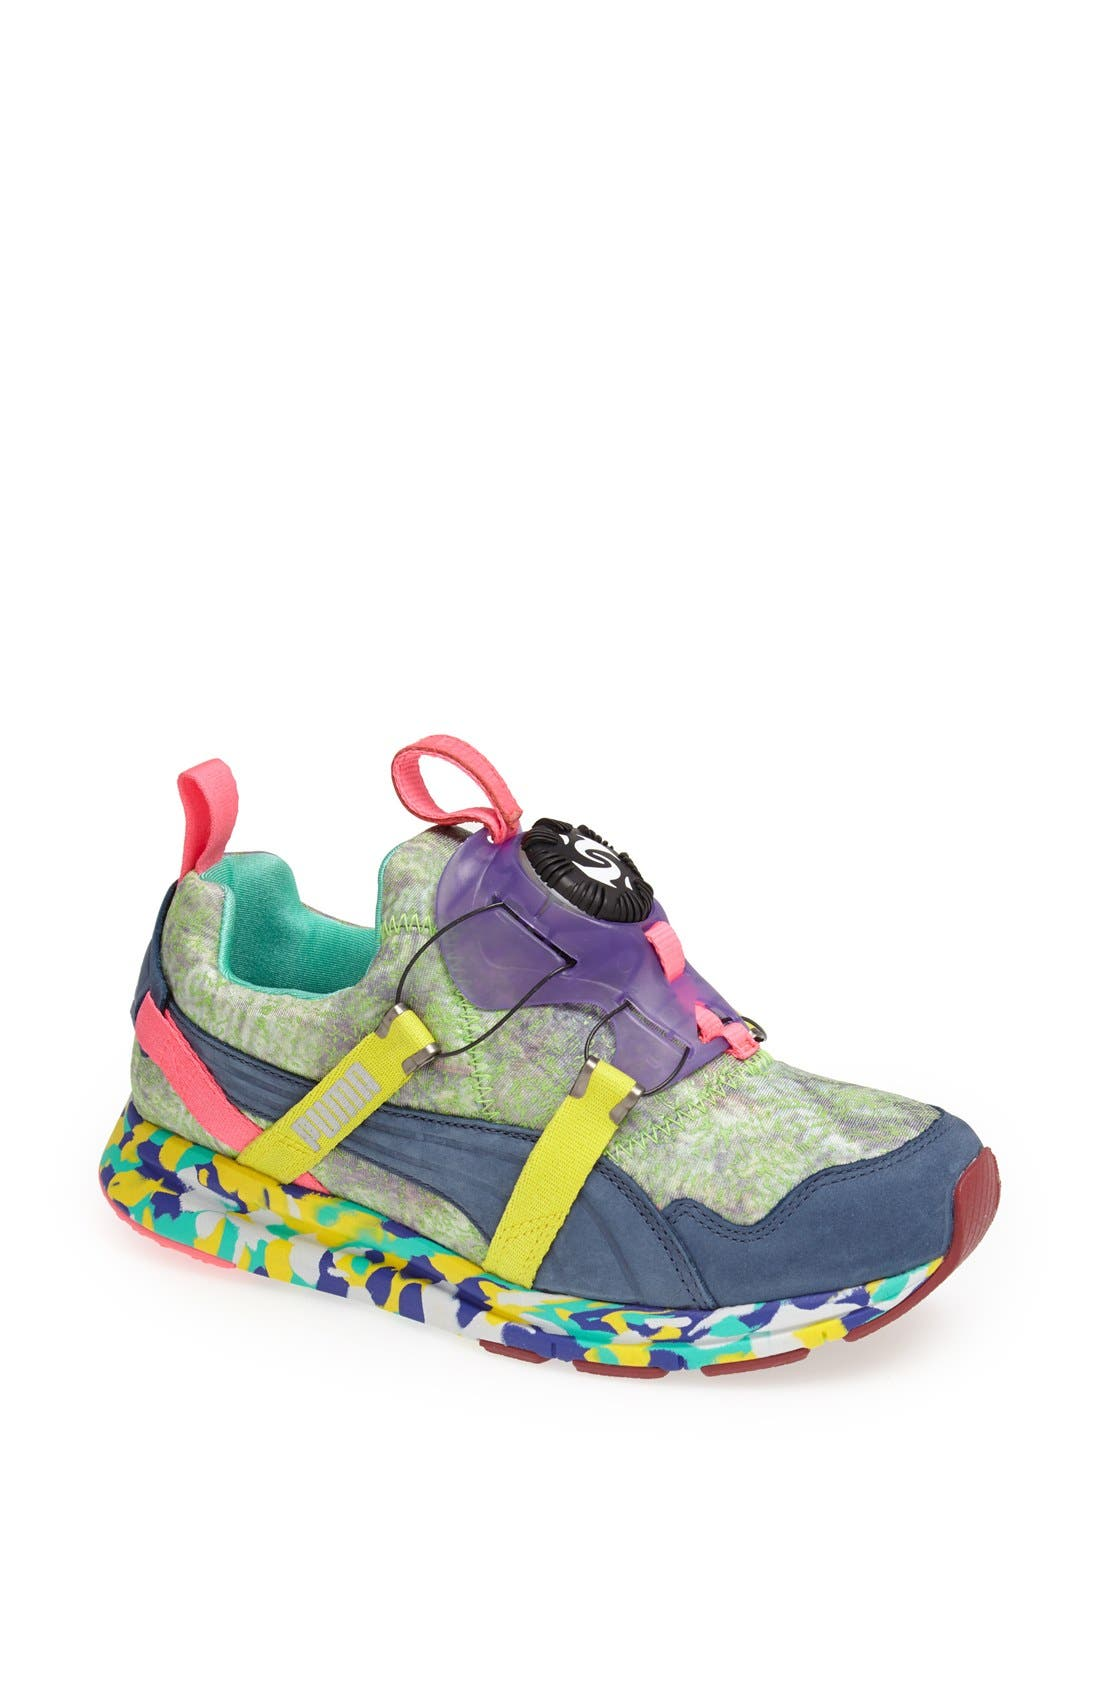 Main Image - PUMA 'Disc - Solange' Sneaker (Women)